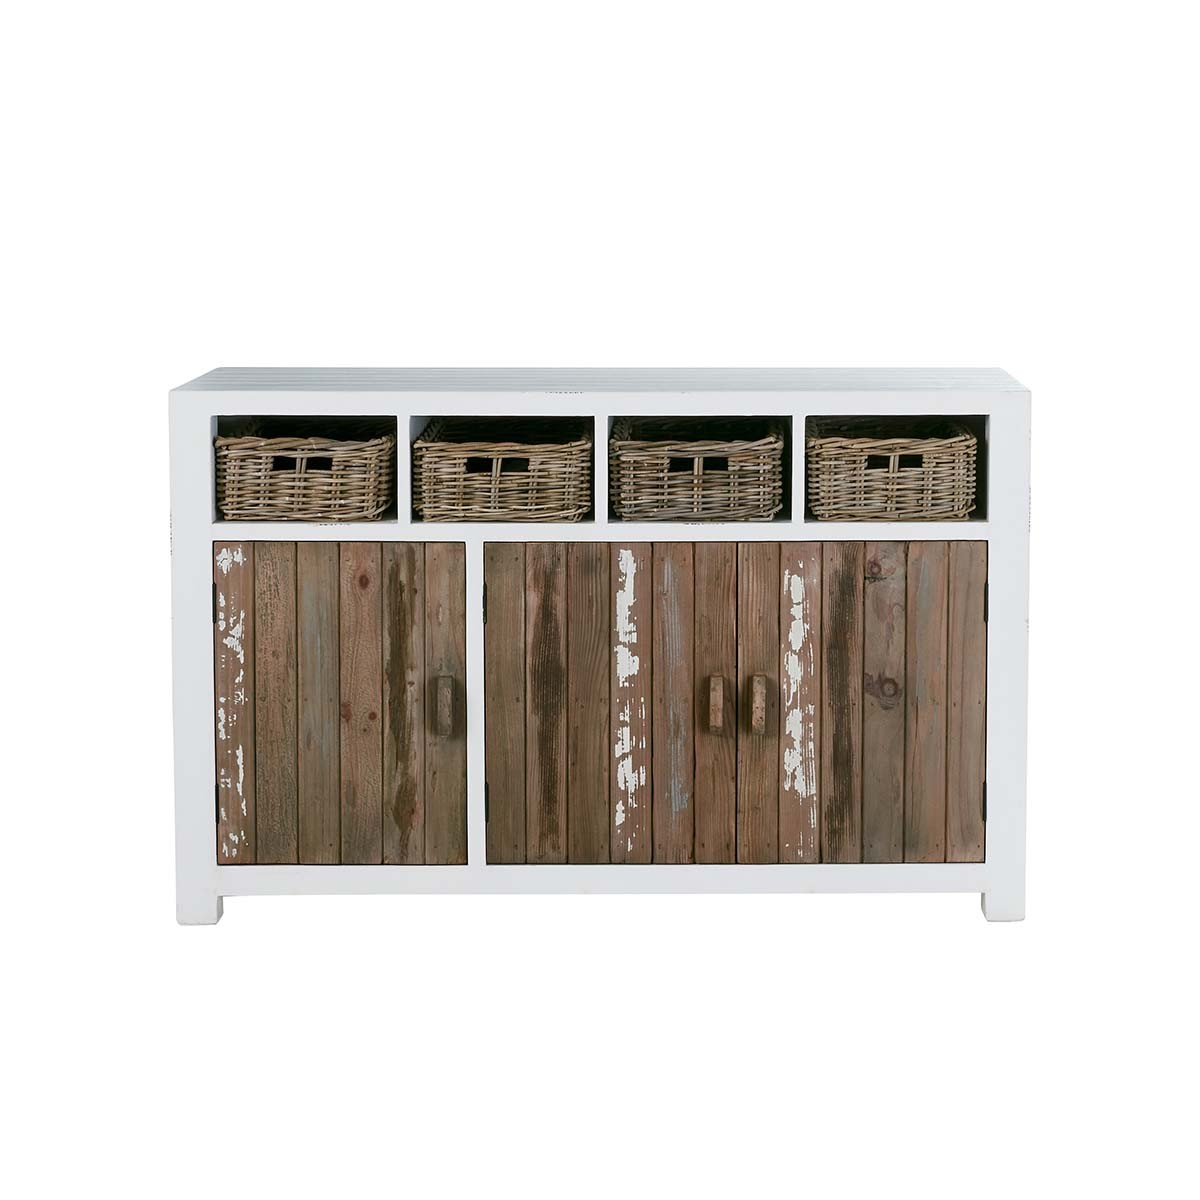 Buffet 3 portes 4 tiroirs en bois de pin recyclé